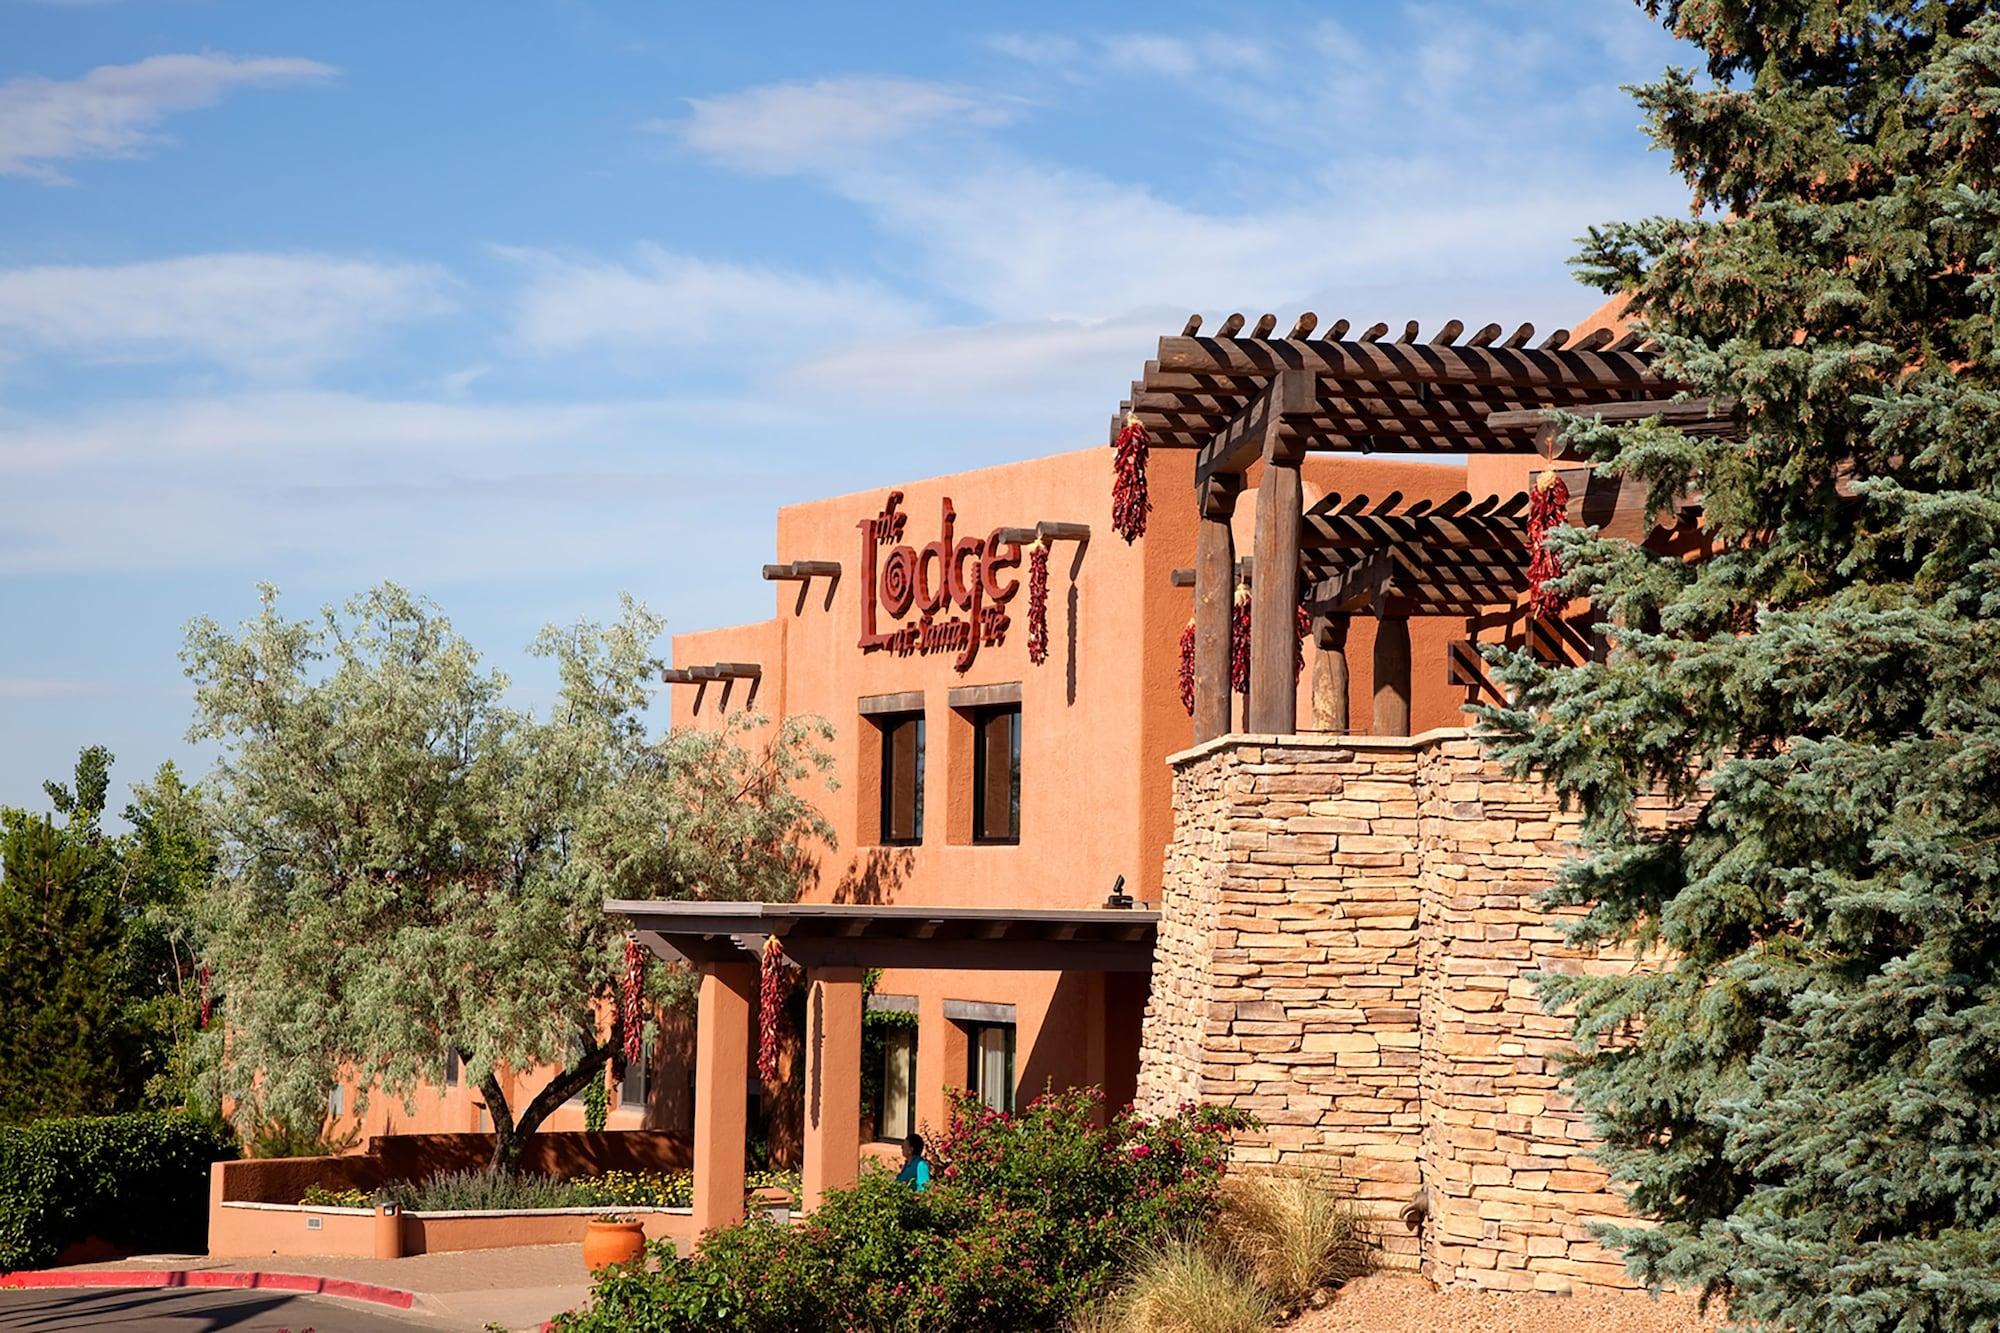 The Lodge at Santa Fe, Santa Fe